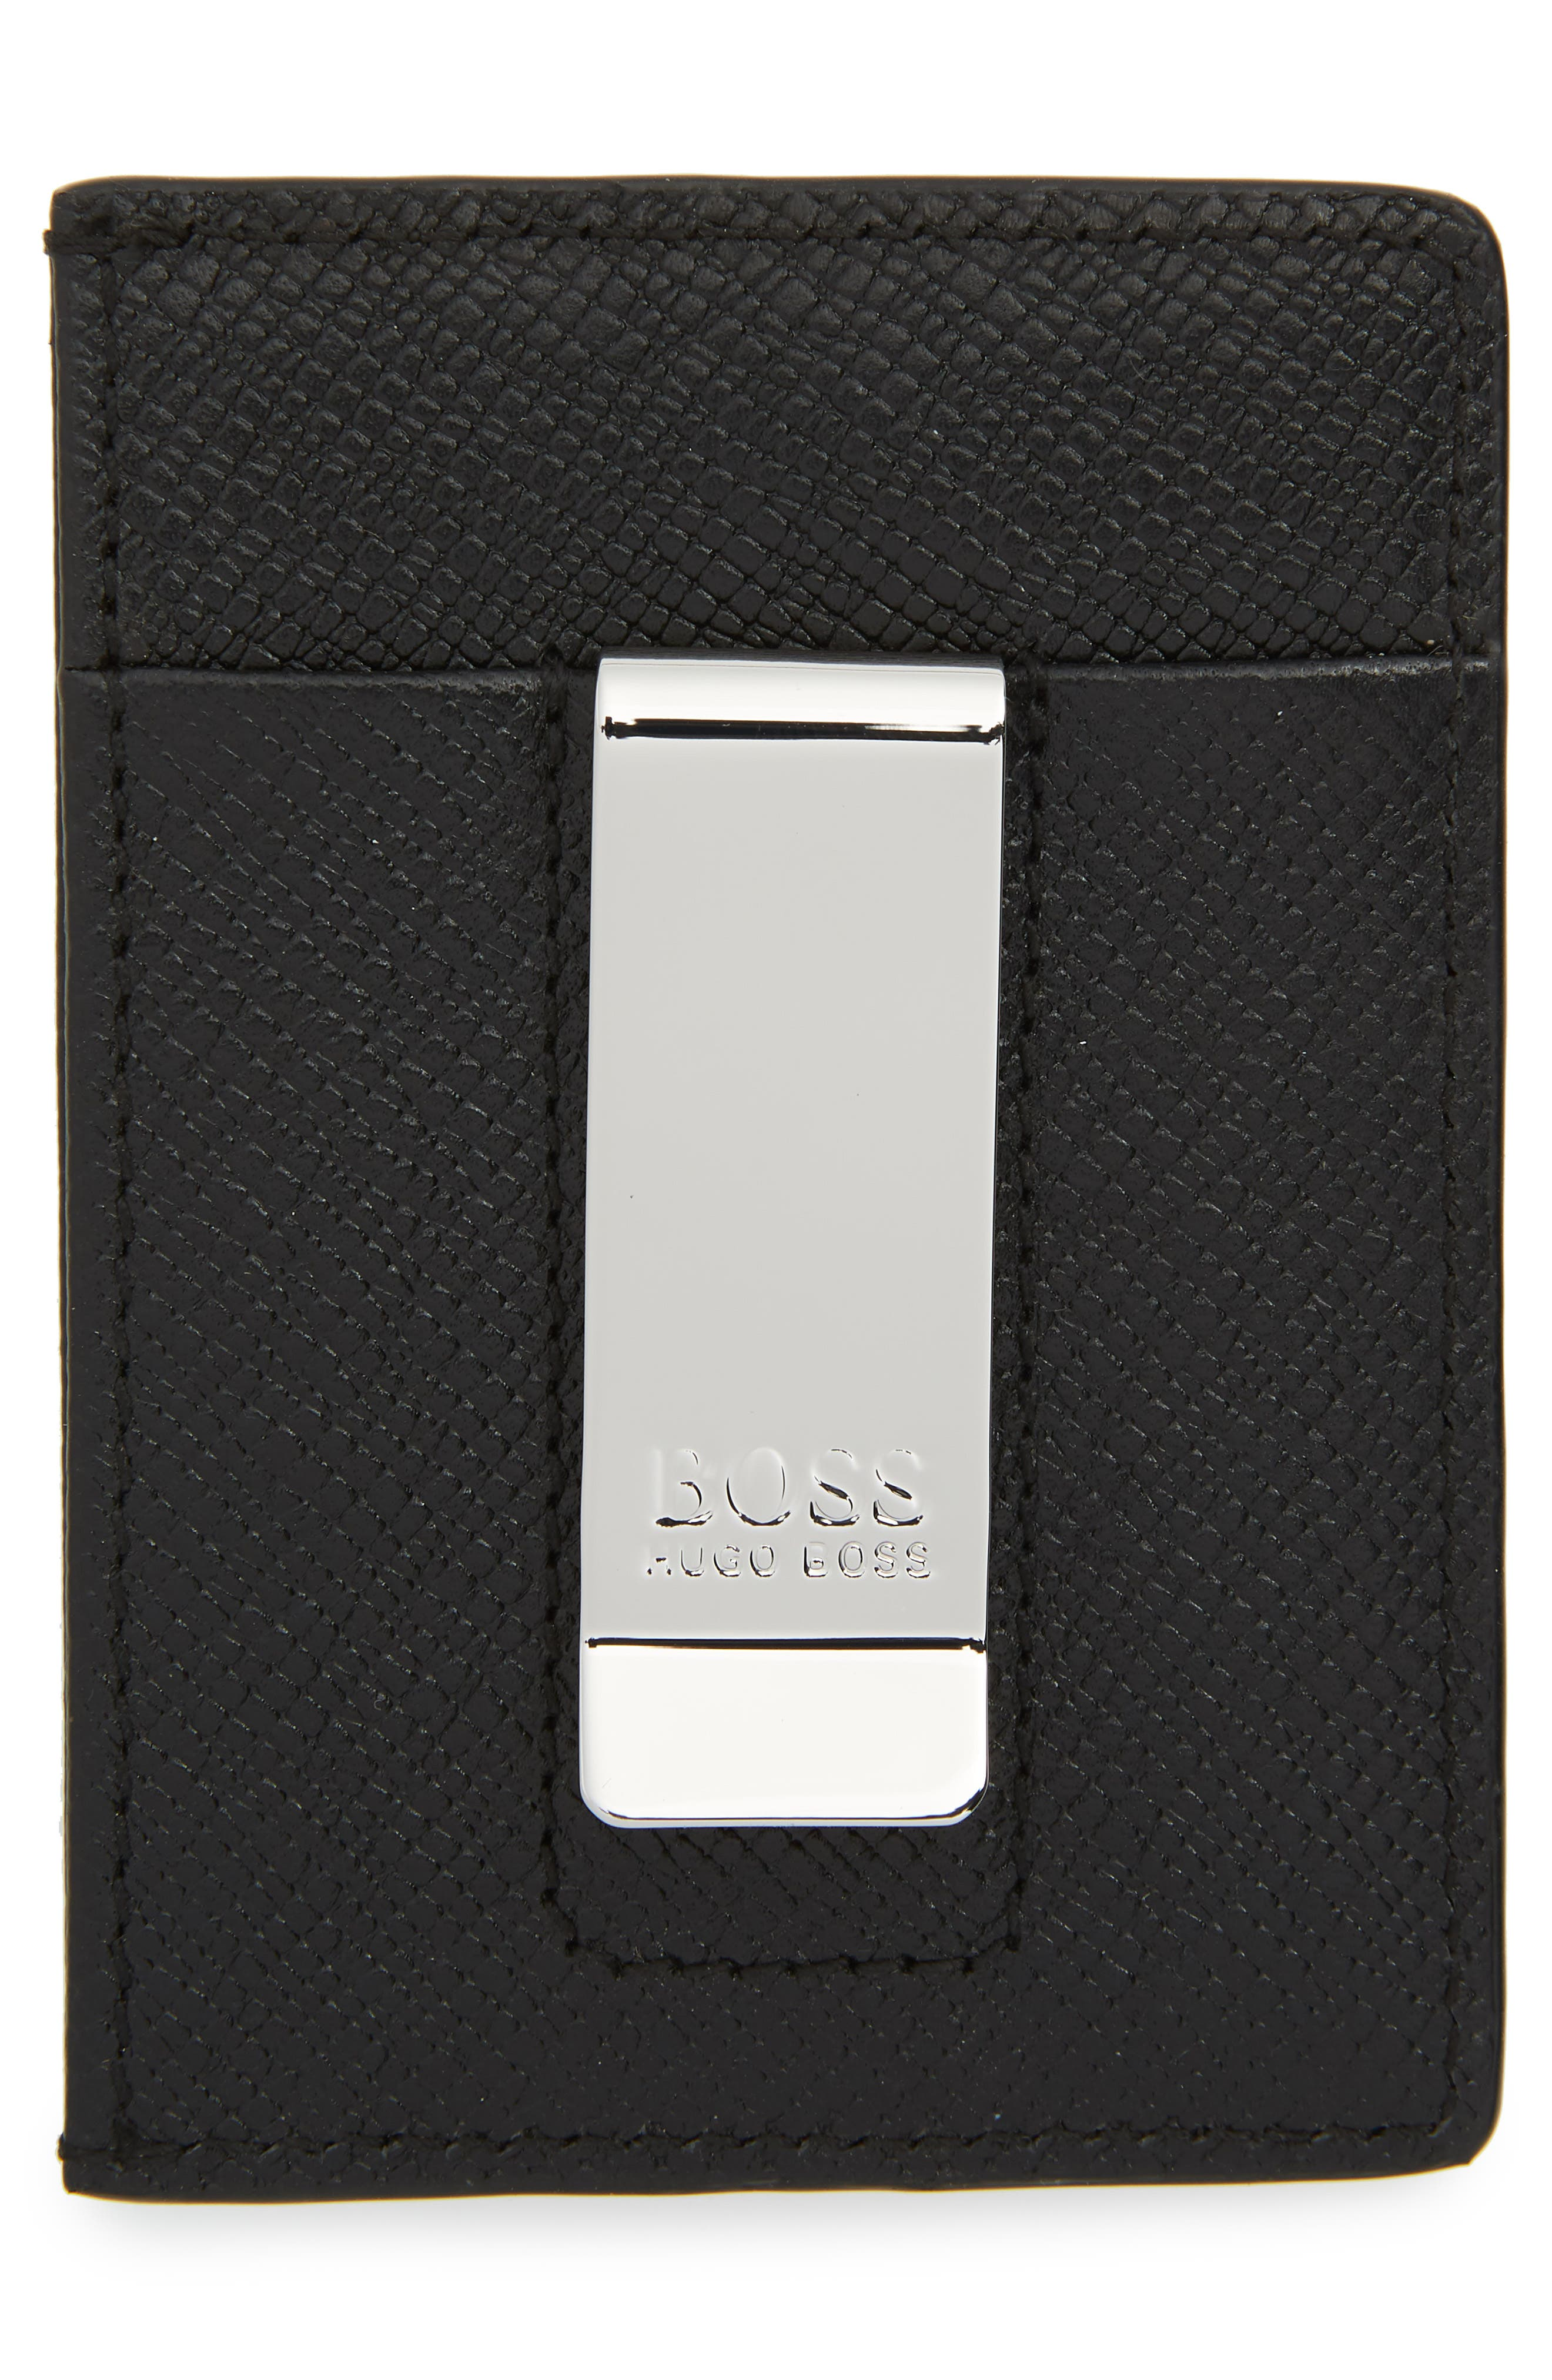 Signature Leather Money Clip,                             Alternate thumbnail 2, color,                             001